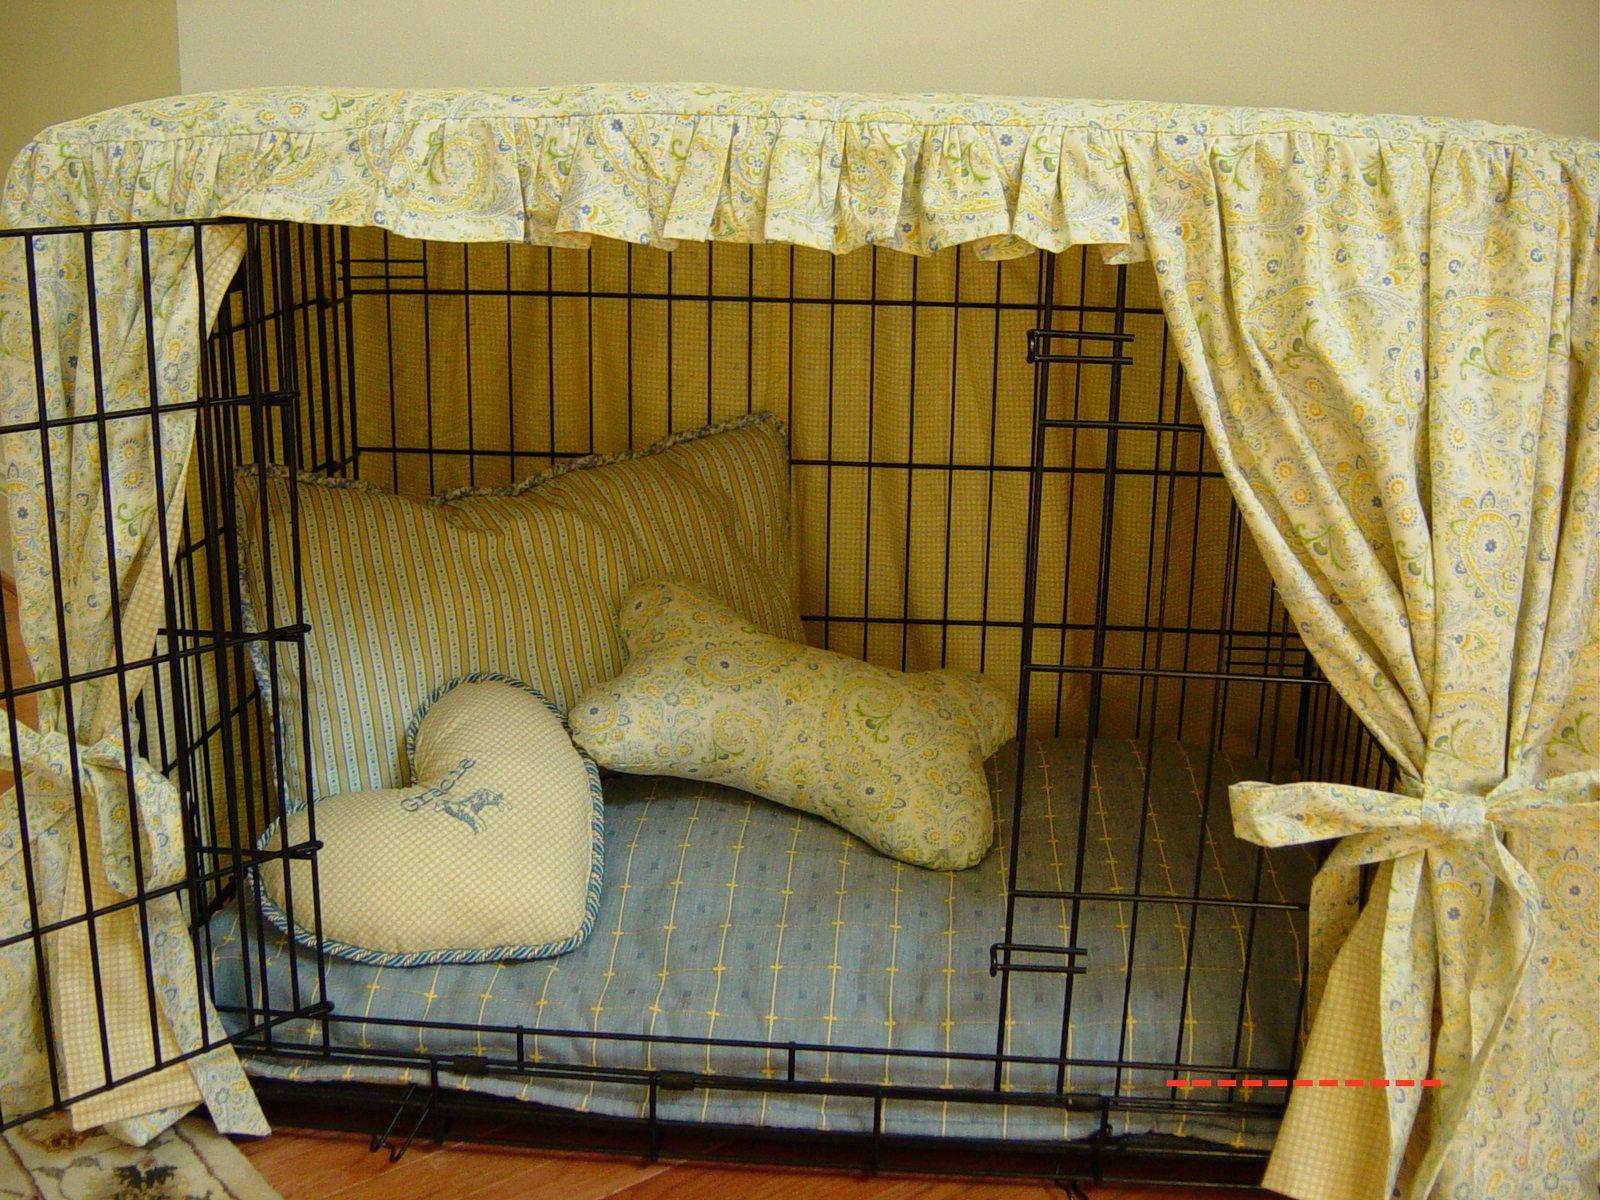 best dog crates images on pinterest  animals dog crates and  - fancy dog cratesi think trixie needs this